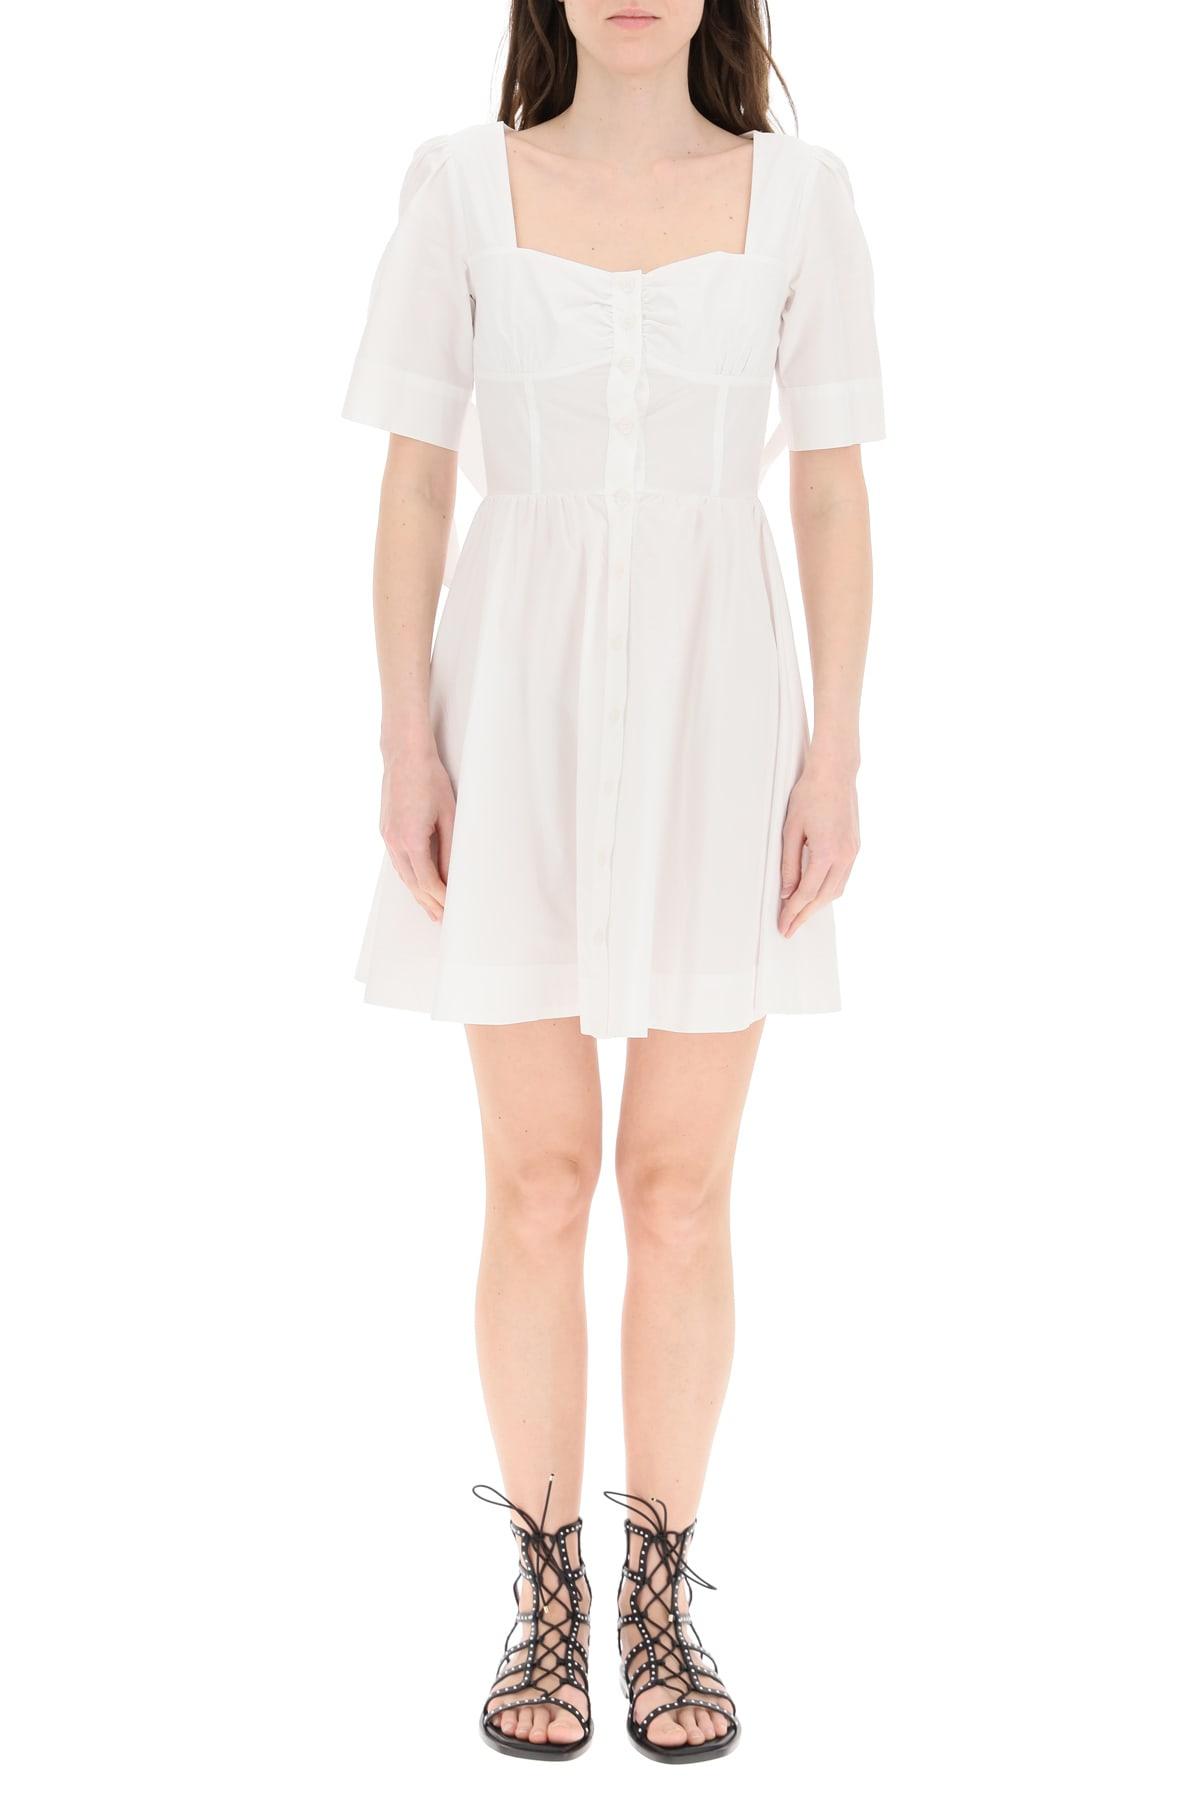 Pinko Cottons MINI SHIRT DRESS IN COTTON